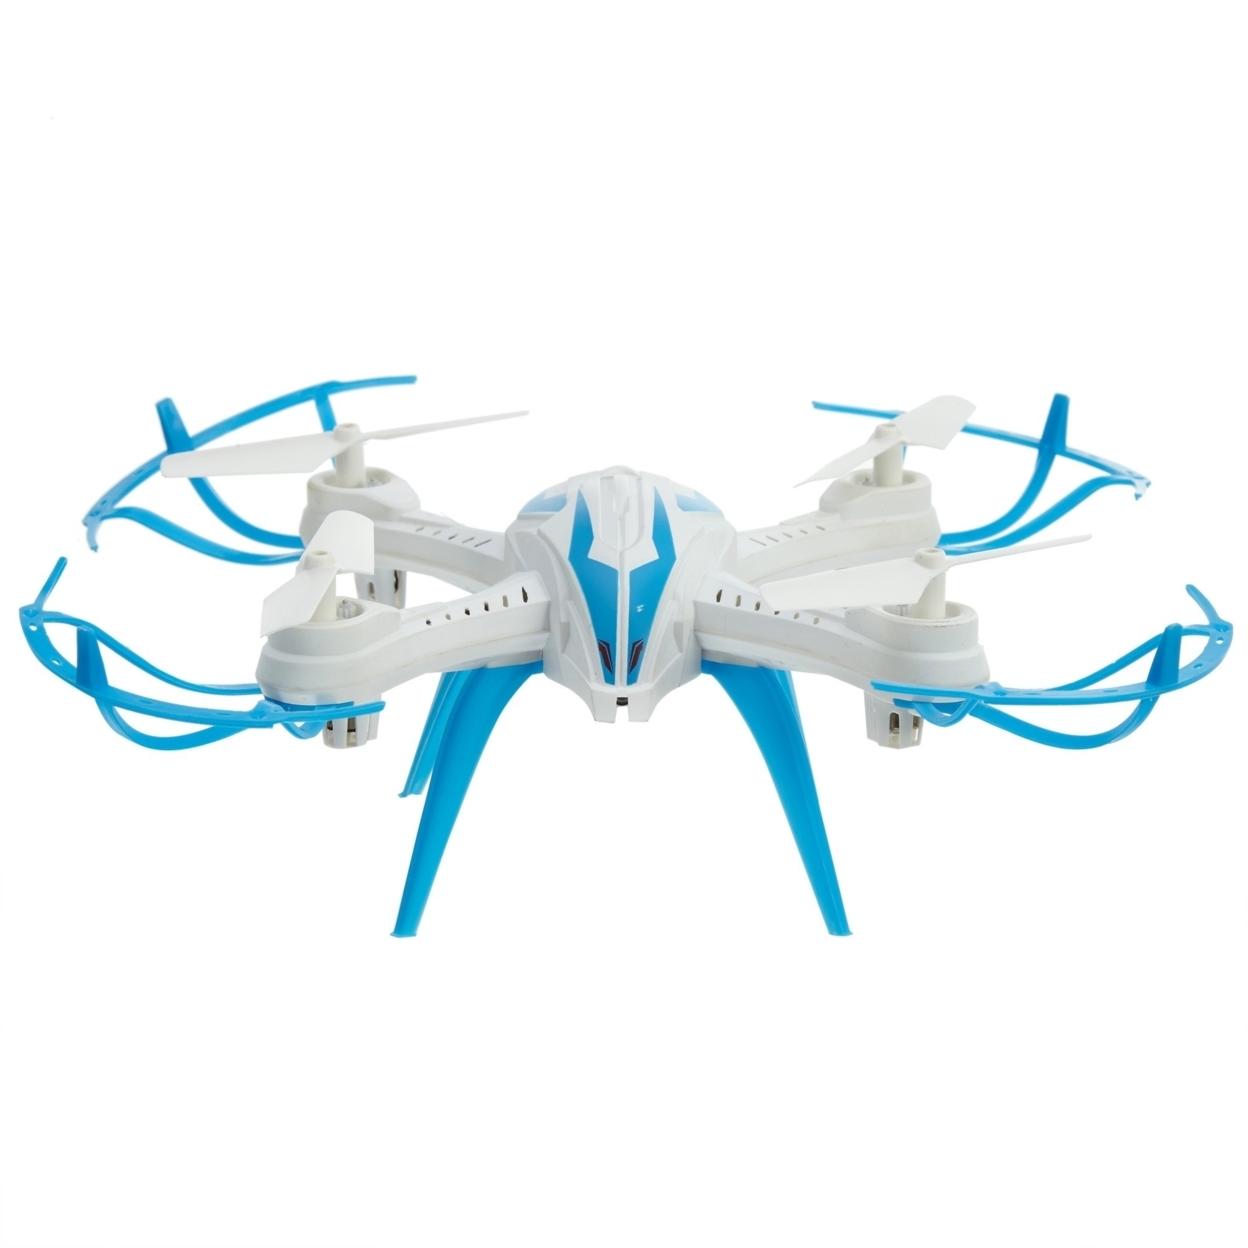 Air America Drone Flight X 15 5a384b132a00e444153dfc2c